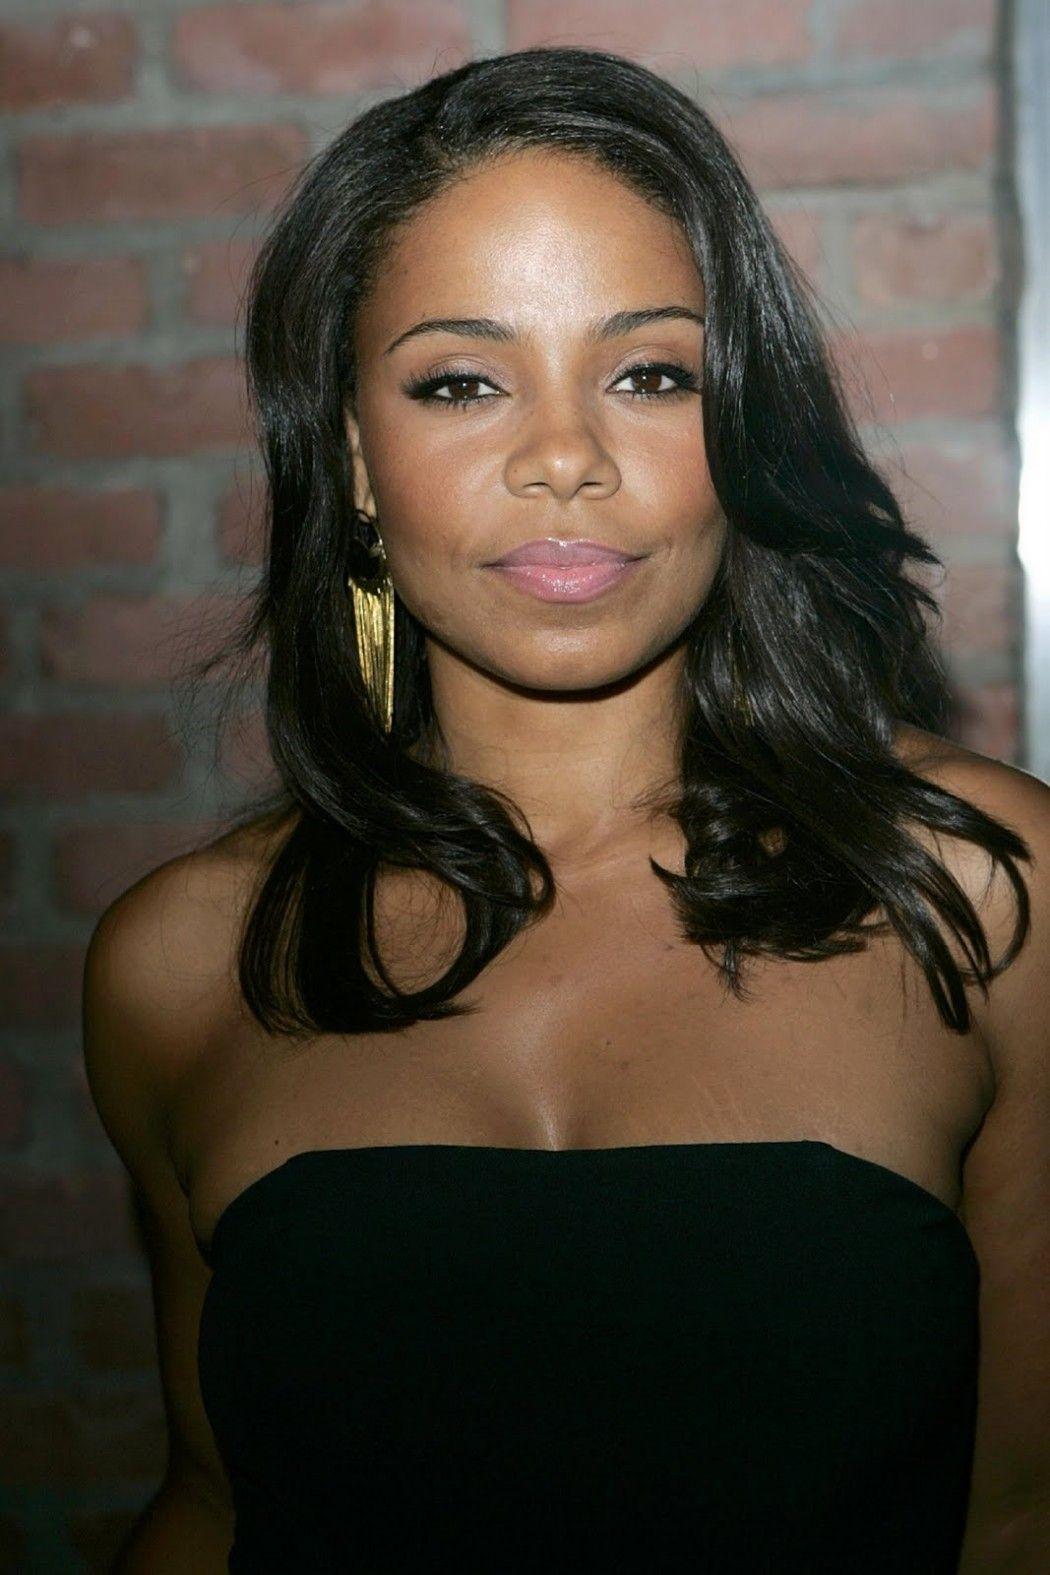 Astonishing 1000 Images About Hairstyles On Pinterest Black Hairstyles Short Hairstyles For Black Women Fulllsitofus